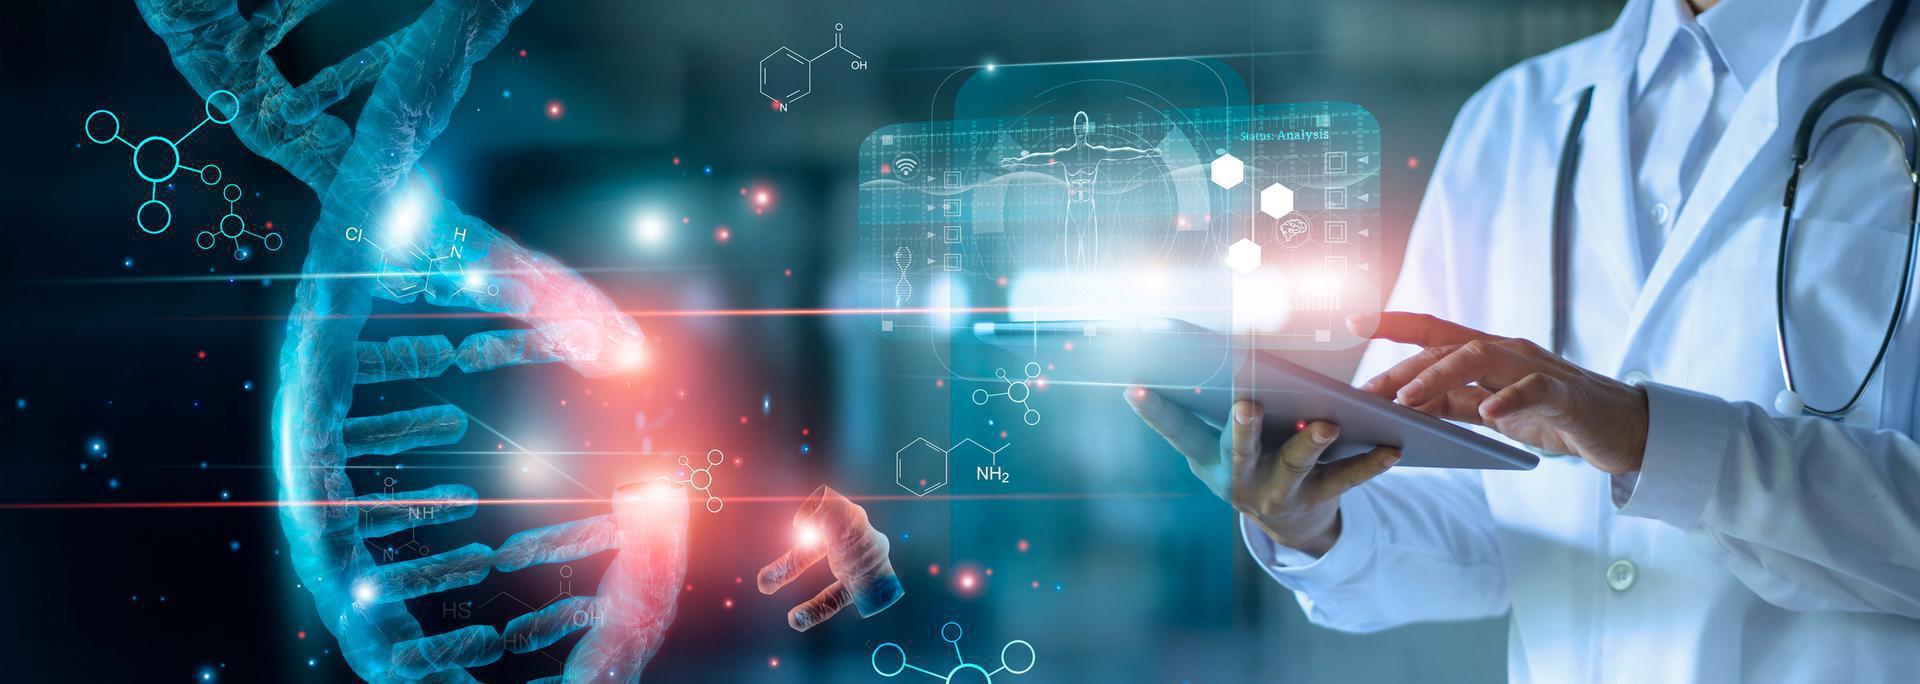 Drug Testing and DNA Testing - Farmington MO - featured